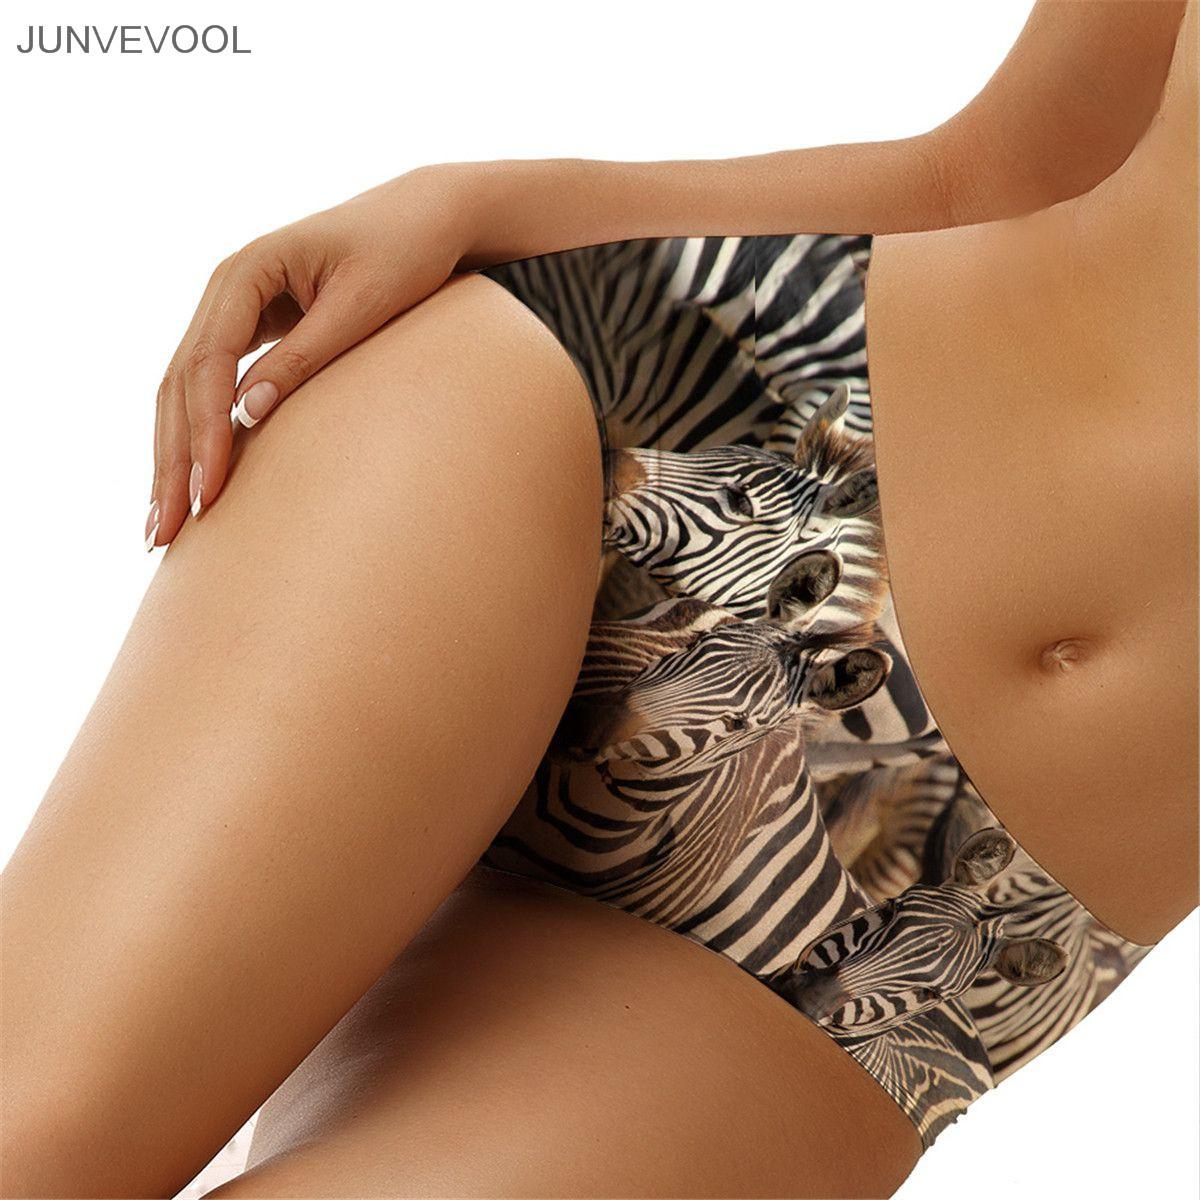 Women Underwear 2017 Knickers 3D Zebra Printing Animal Tattoo Underpants Sexy Knickers Panties Lingerie Briefs Underwear(China (Mainland))